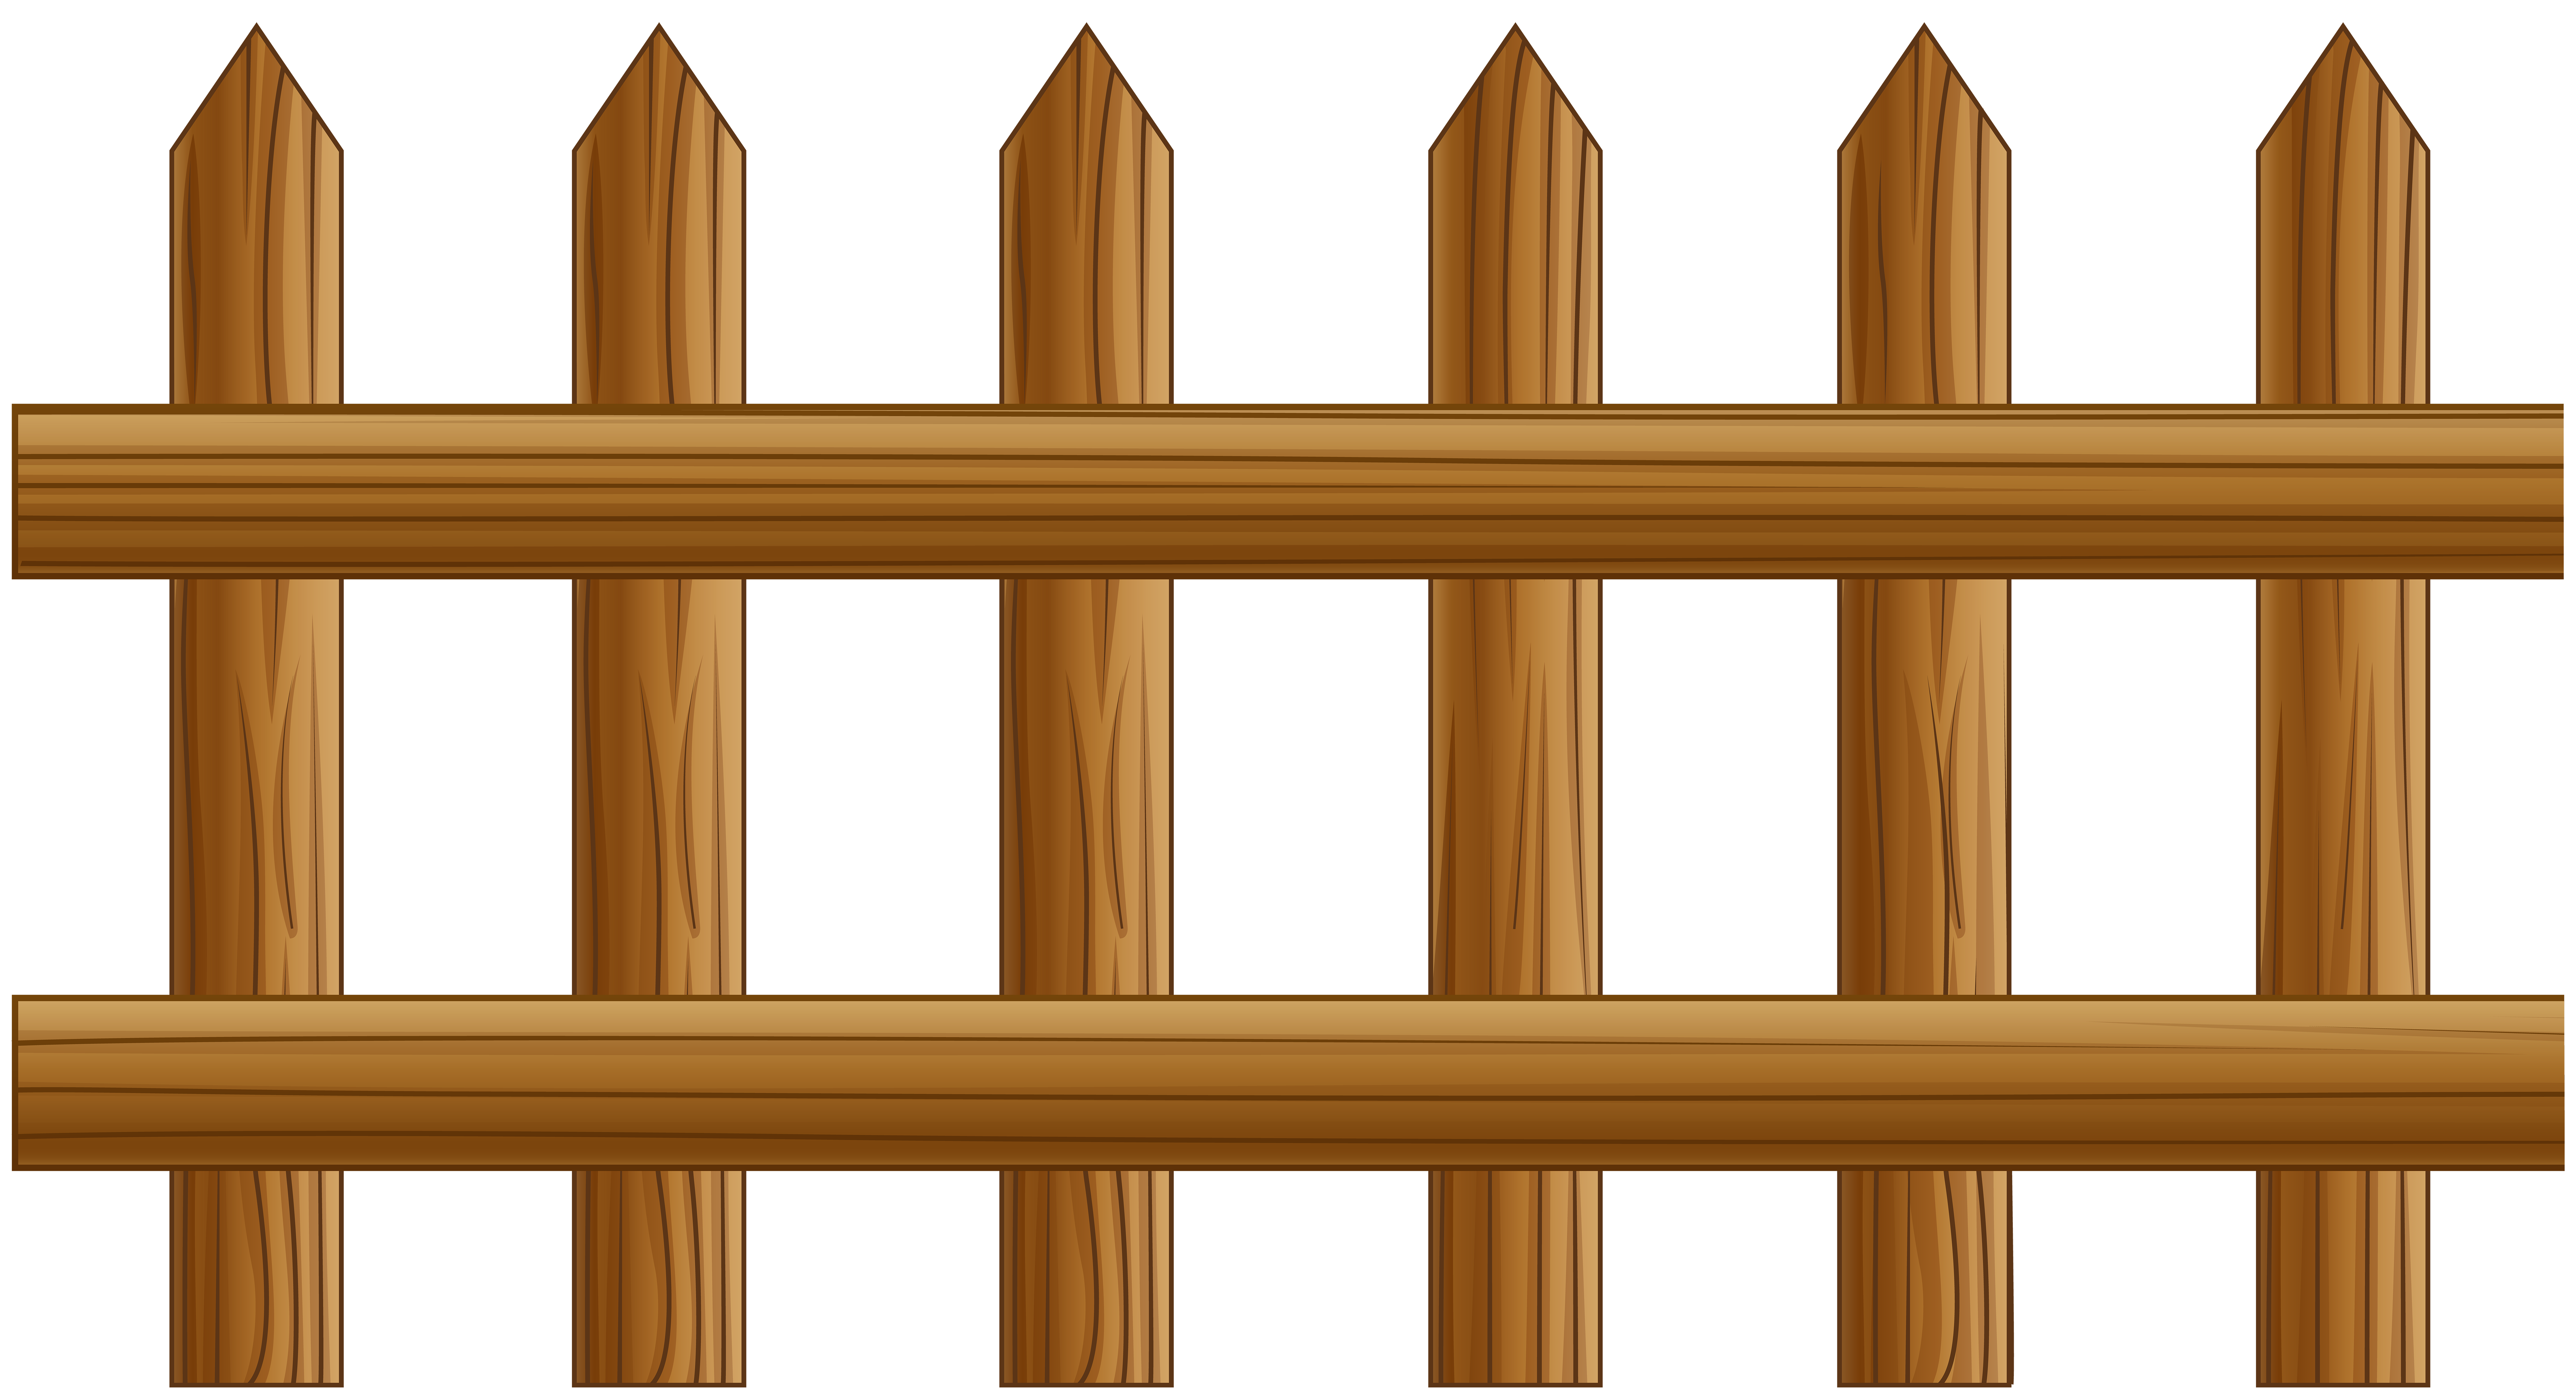 Fence Clip Art PNG Image.